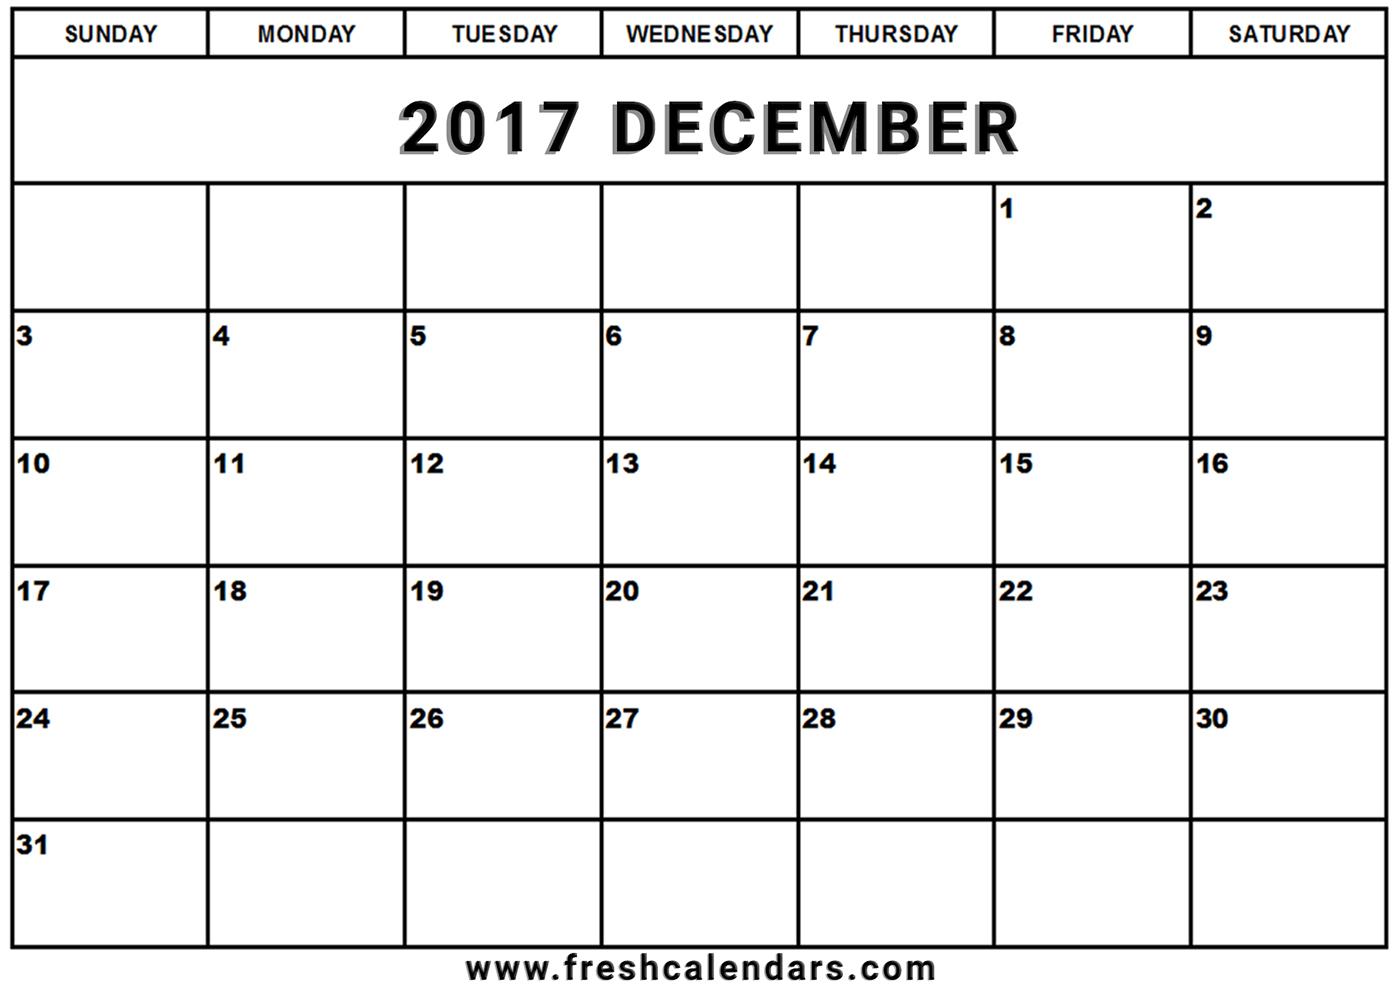 December 2017 Calendar Printable - Fresh Calendars for Blank Dec Calendar Printable